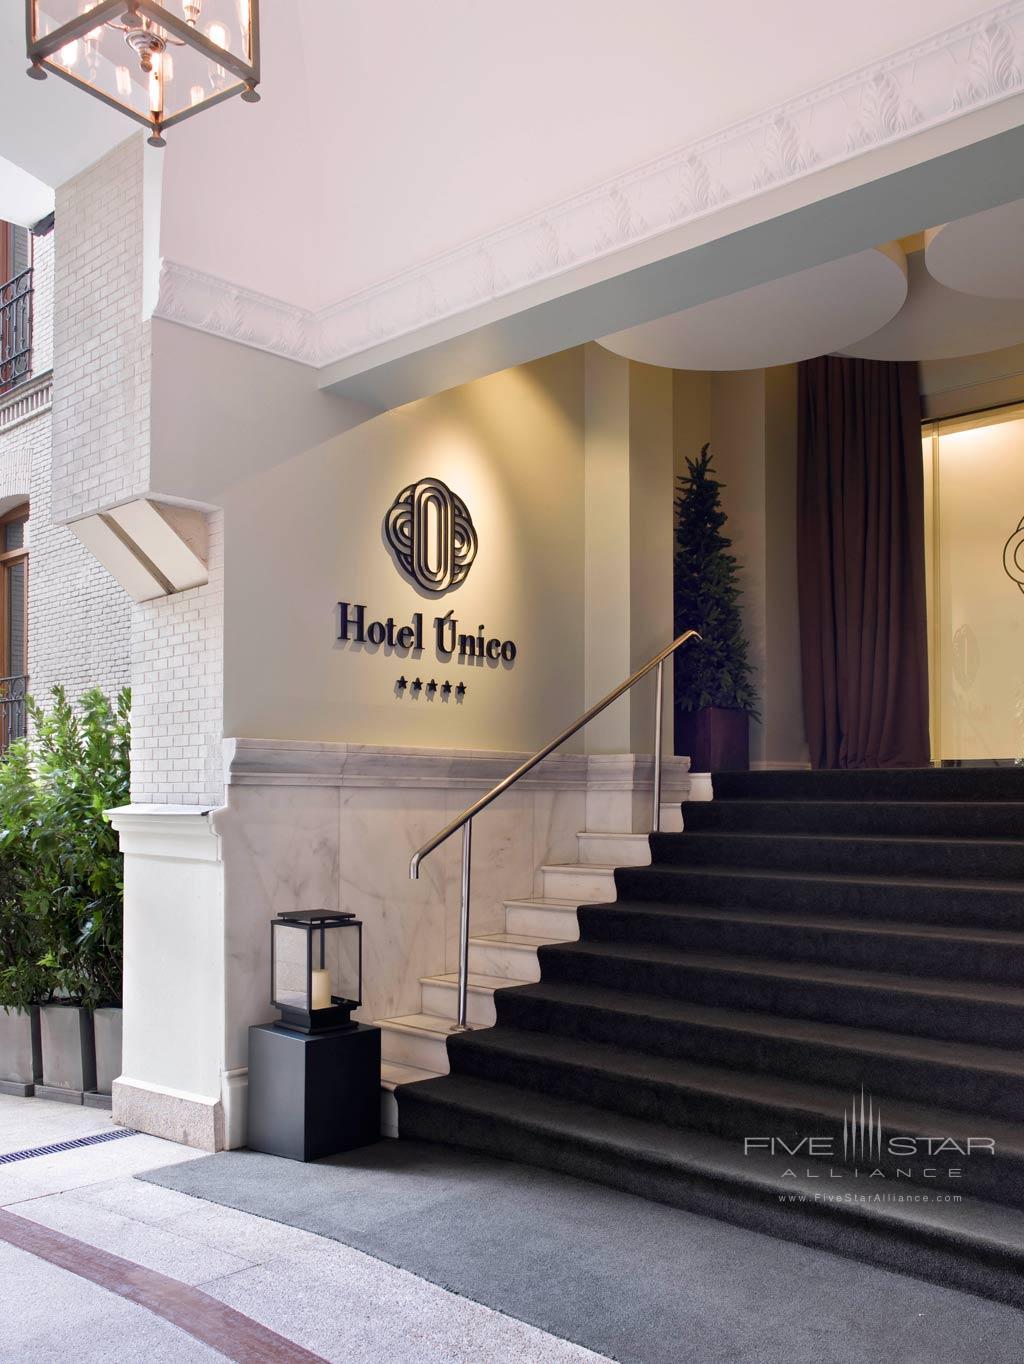 Hotel Unico Madrid, Spain